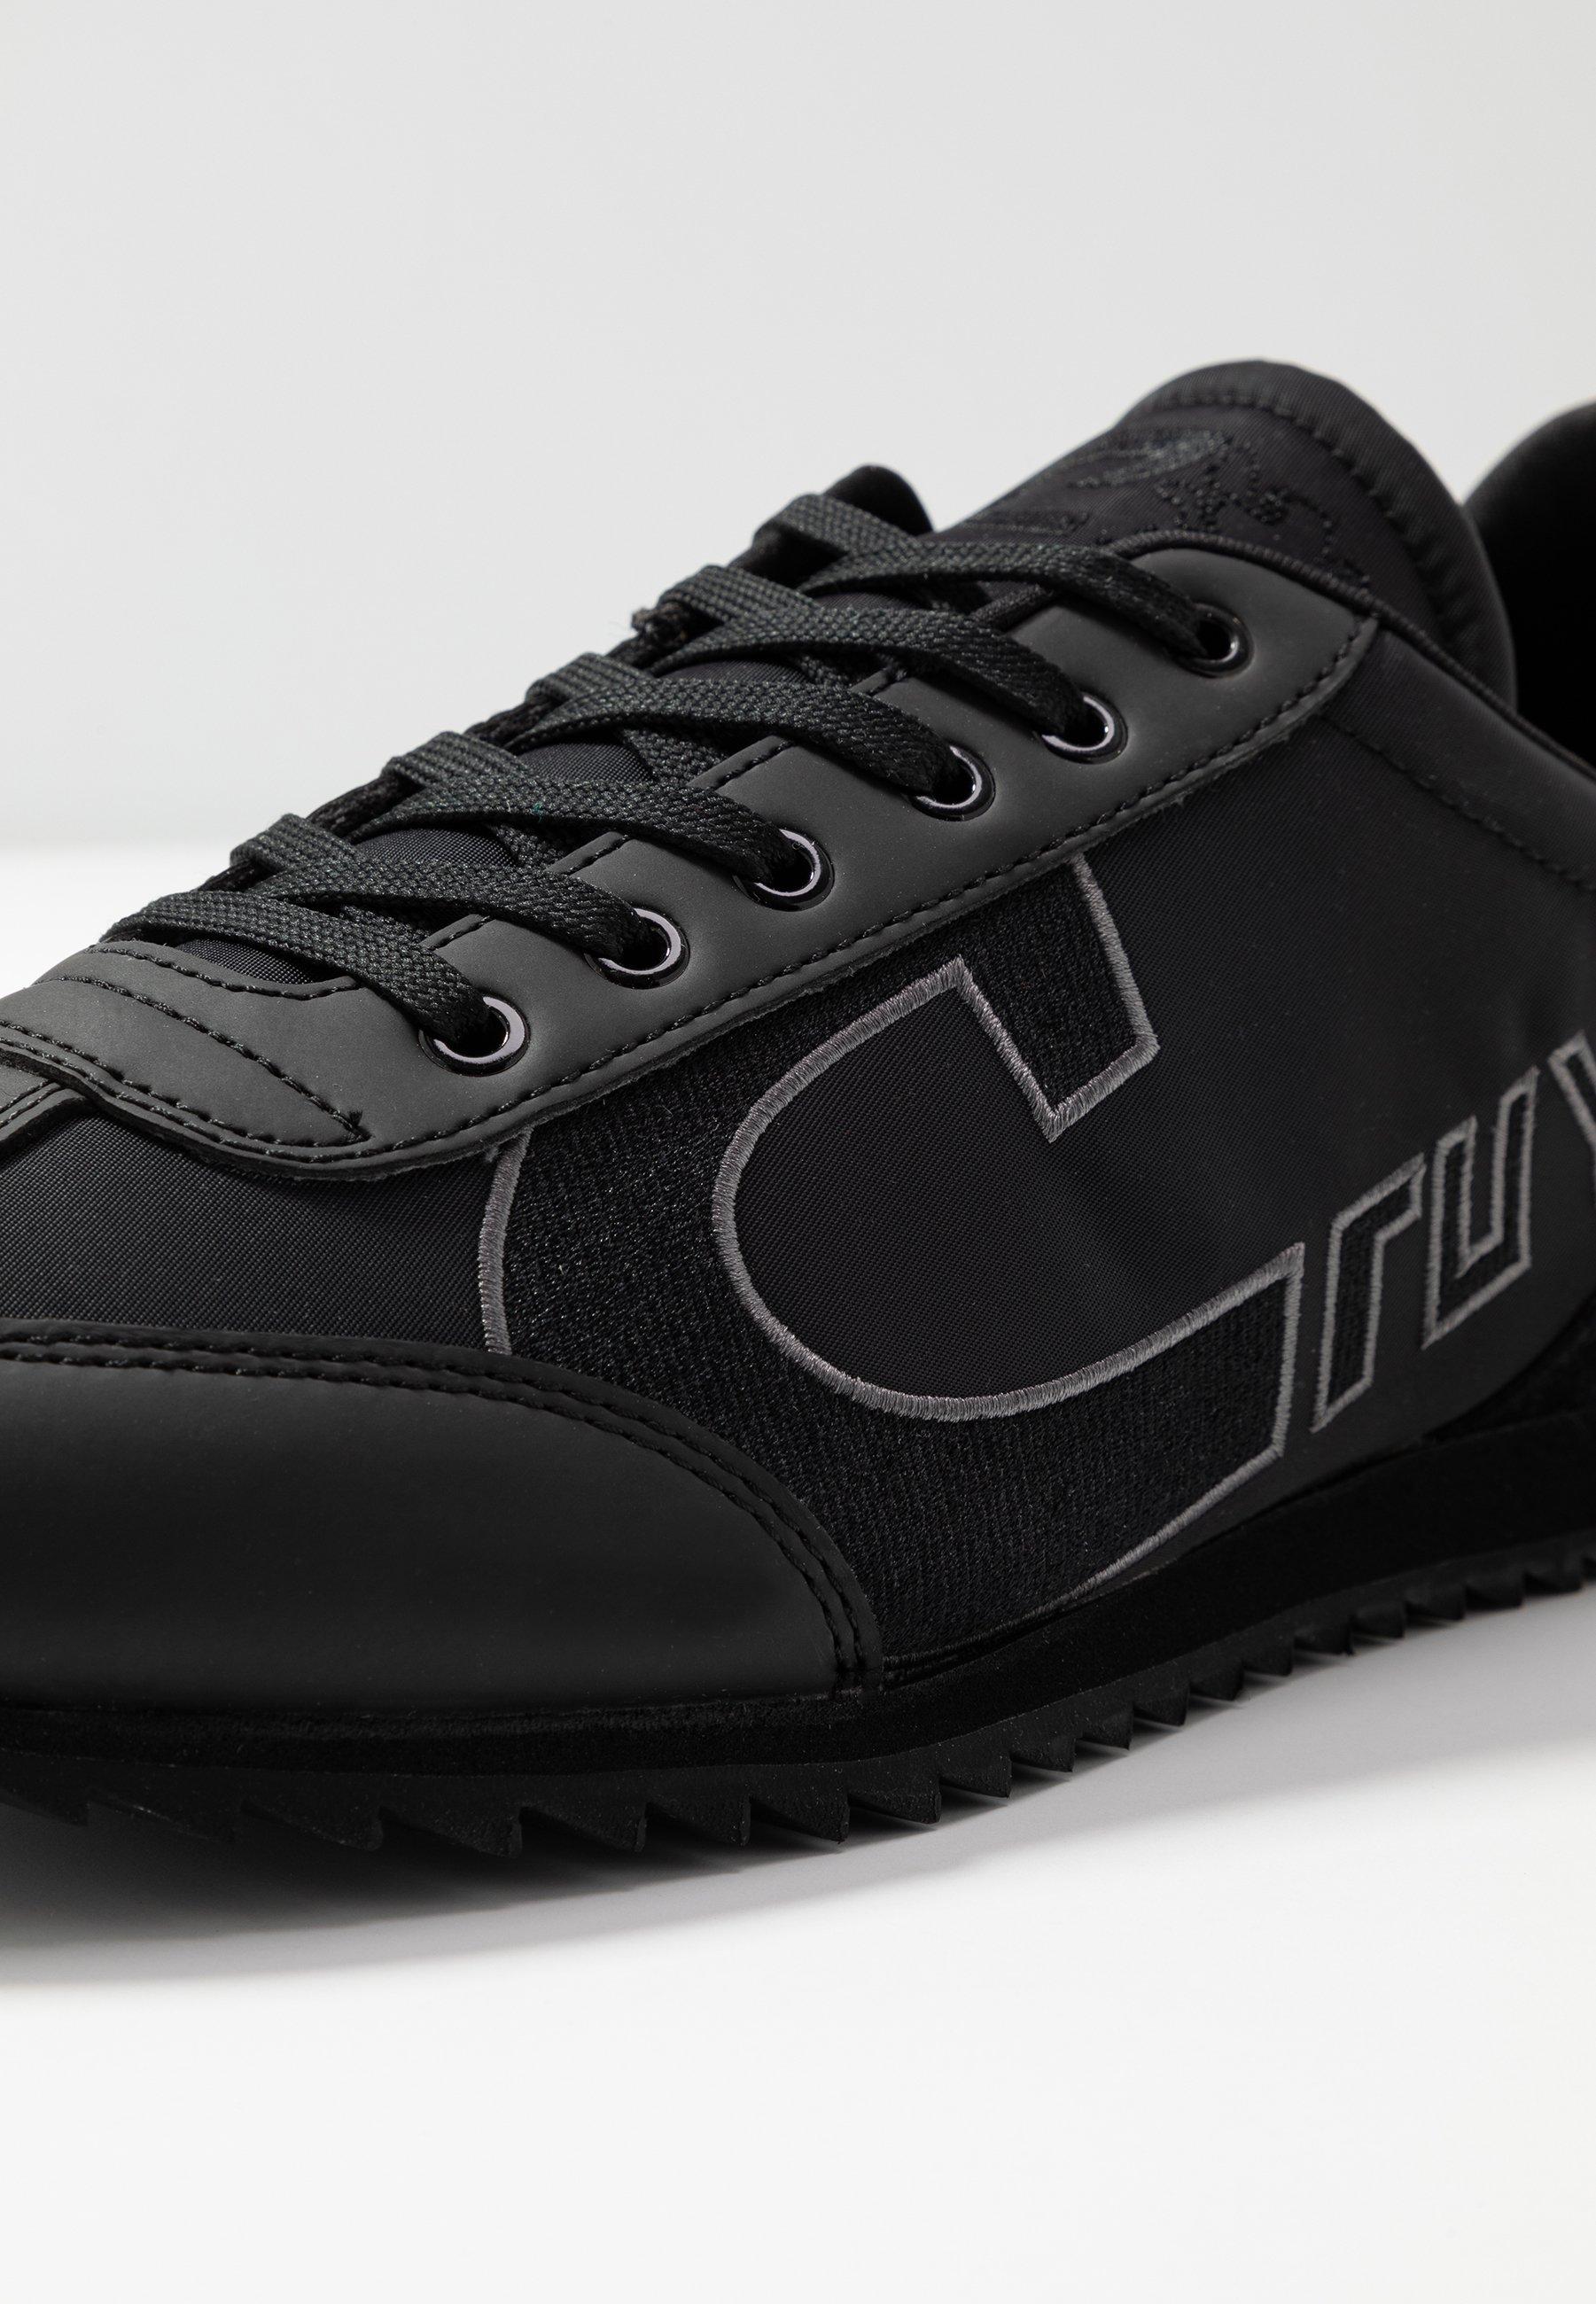 Cruyff INDIPHISTO Joggesko black Zalando.no